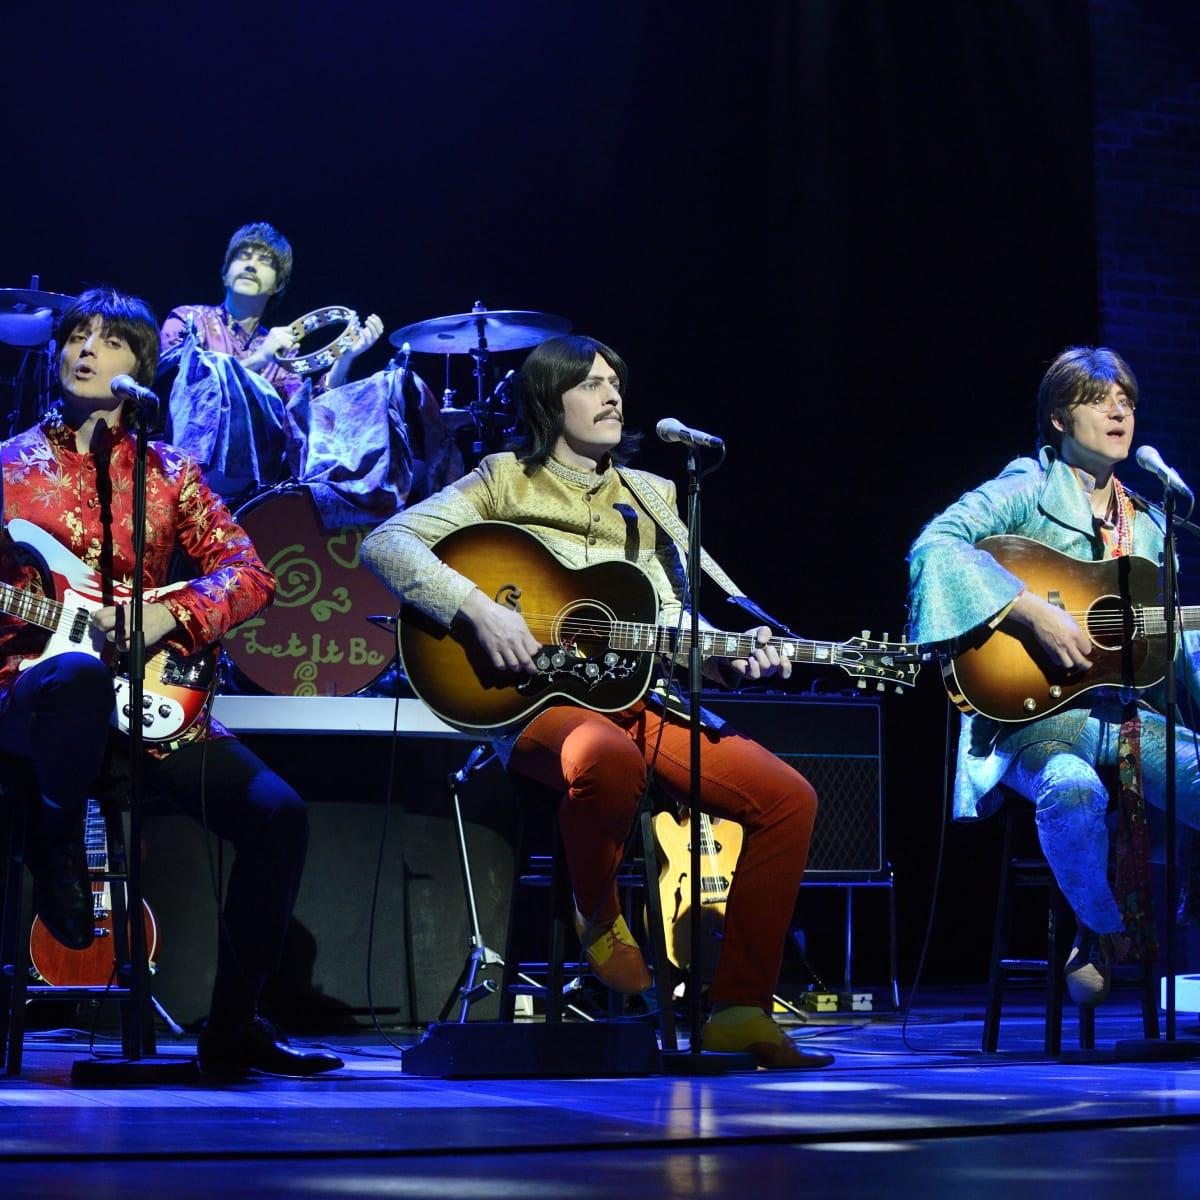 Let It Be Beatles musical